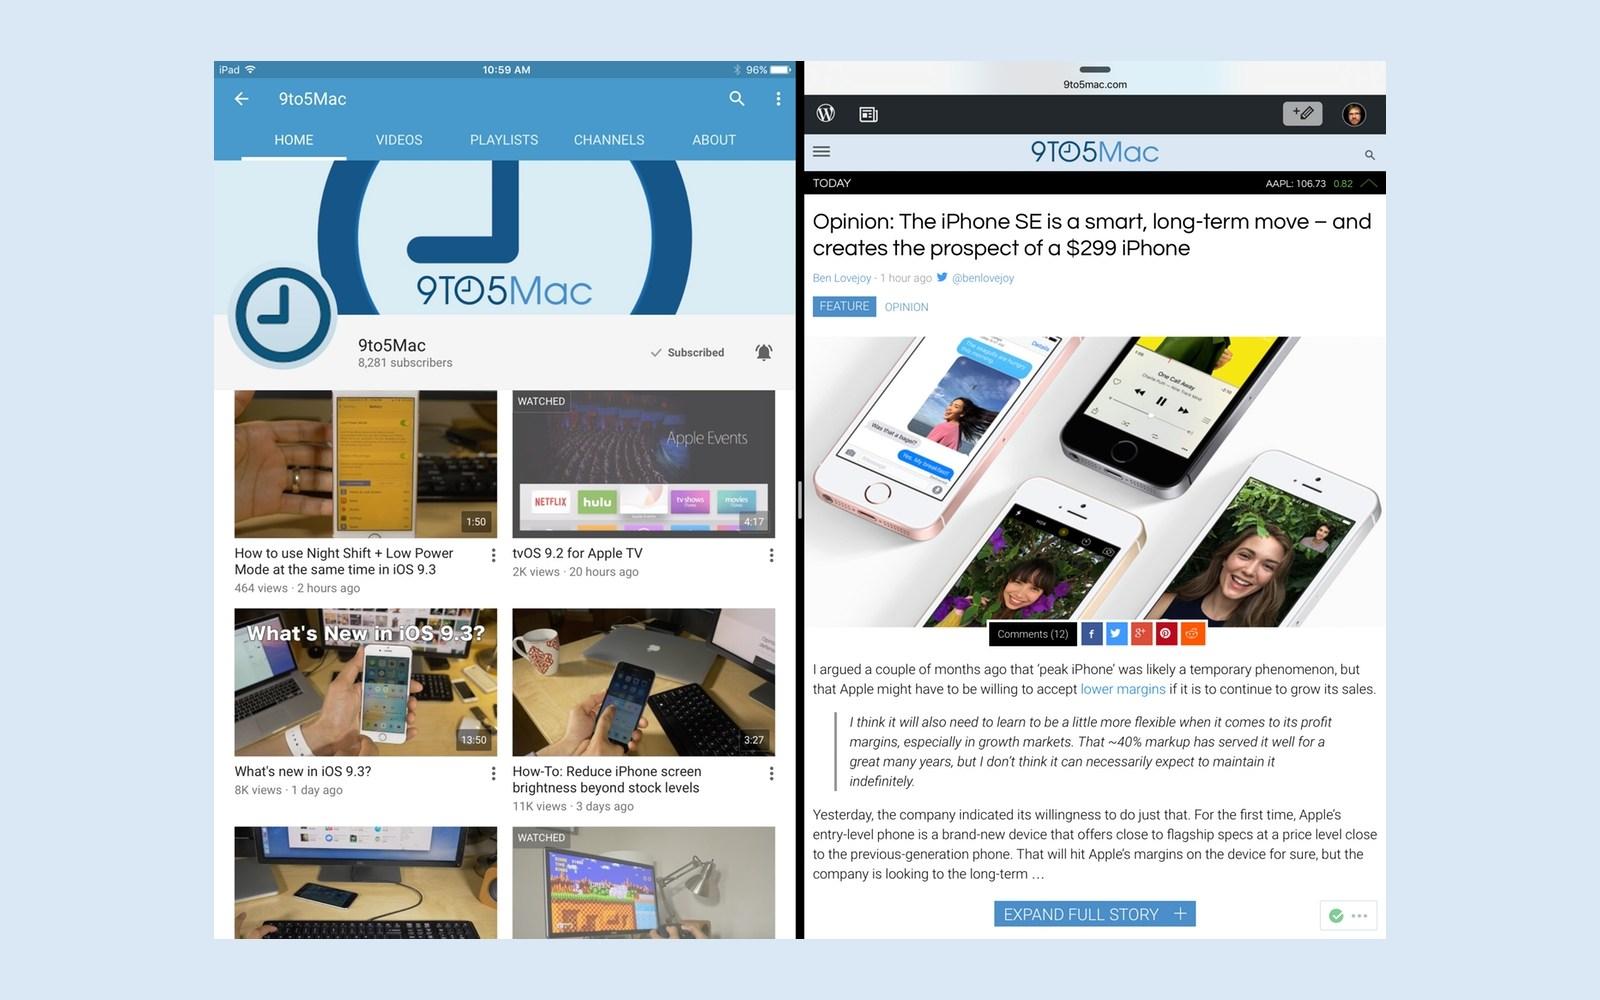 YouTube for iPad gains Split View and Slide Over multitasking on iOS 9, still lacks PIP